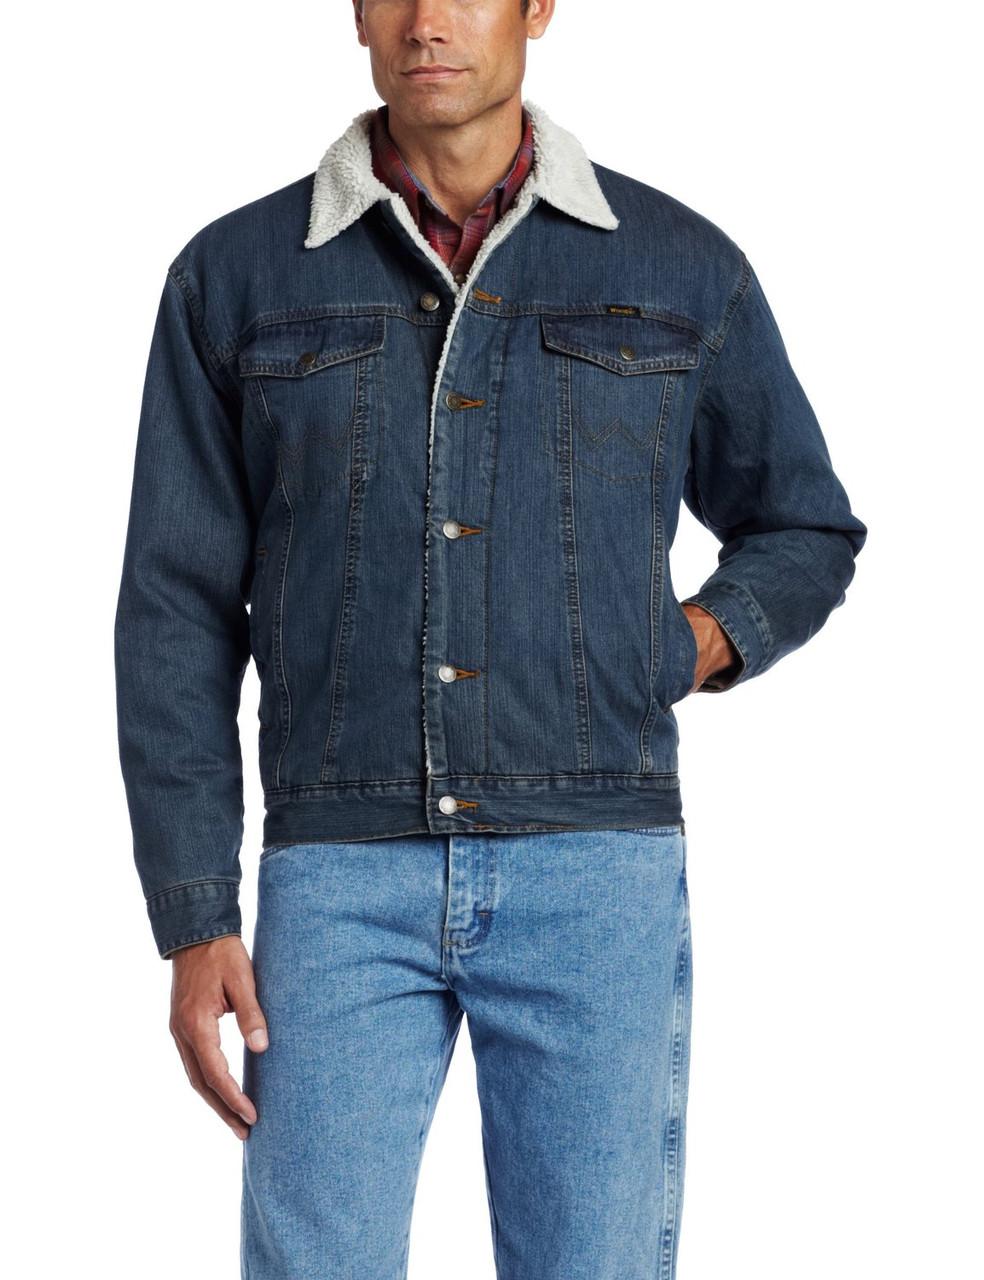 Куртка Wrangler Men's Rustic Sherpa Lined Jacket